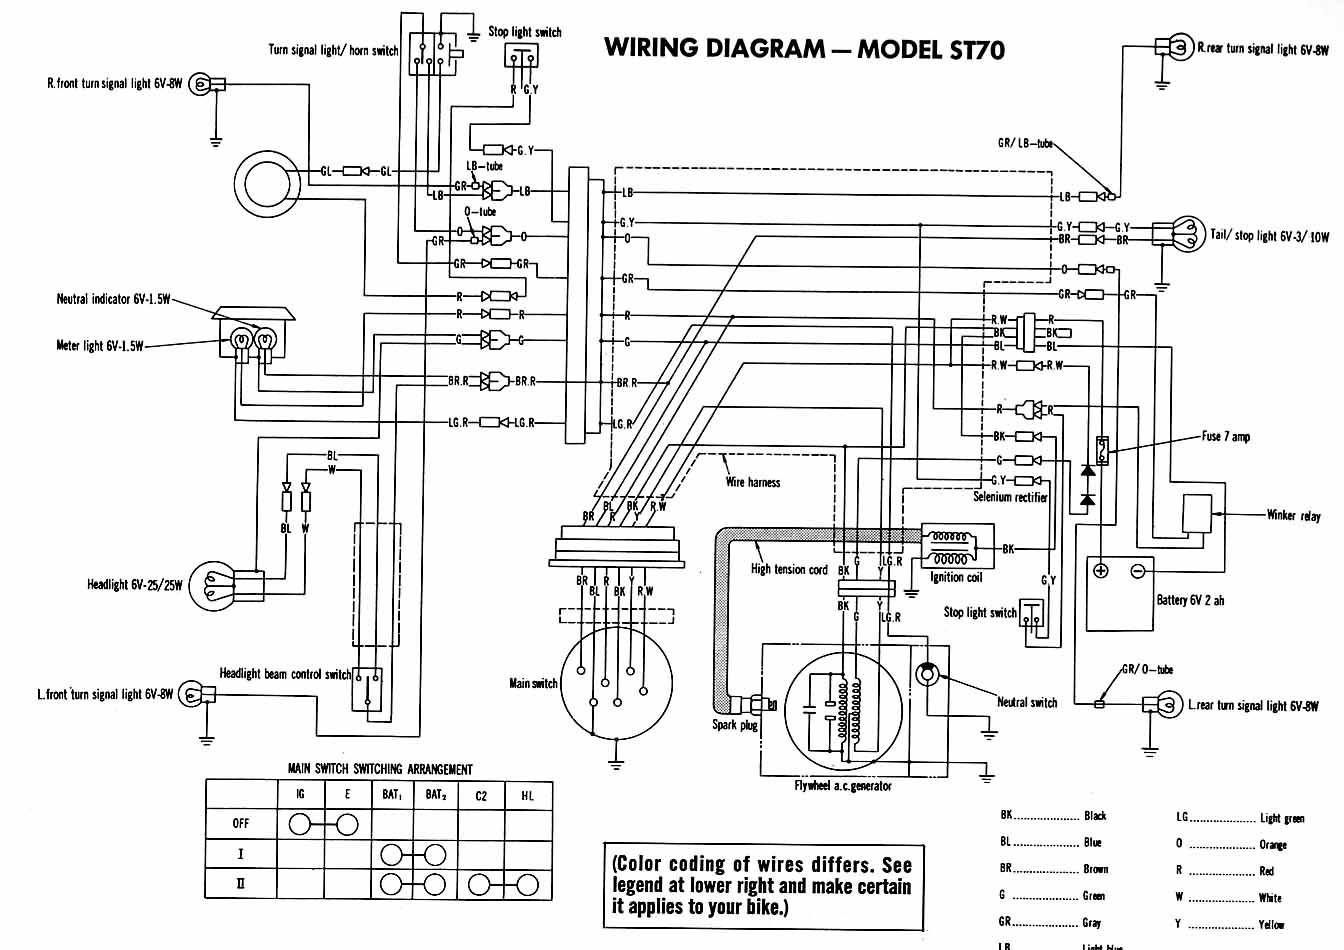 suzuki alto 11 wiring diagram